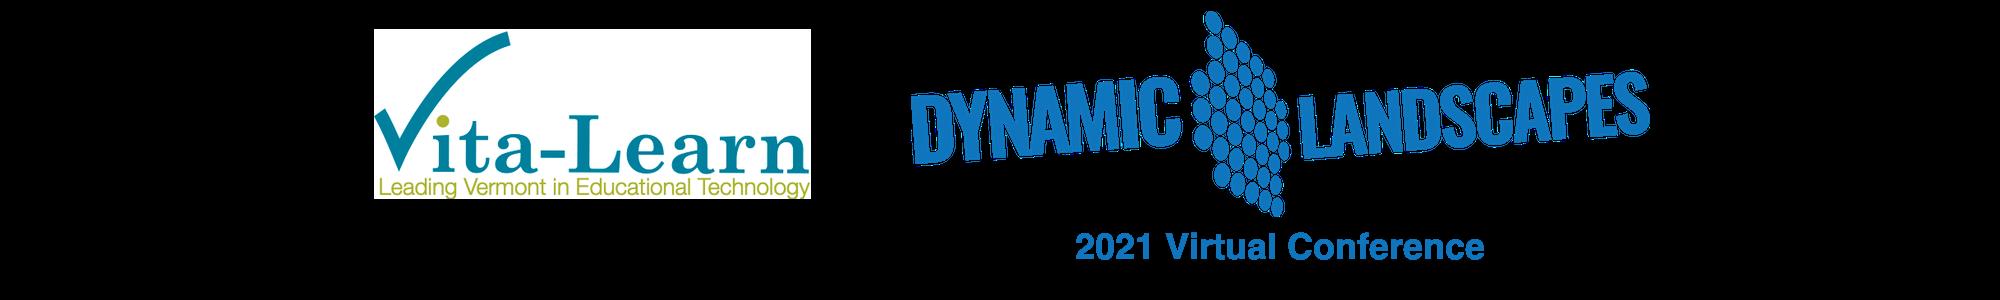 Dynamic Landscapes 2021 Virtual Conference Header